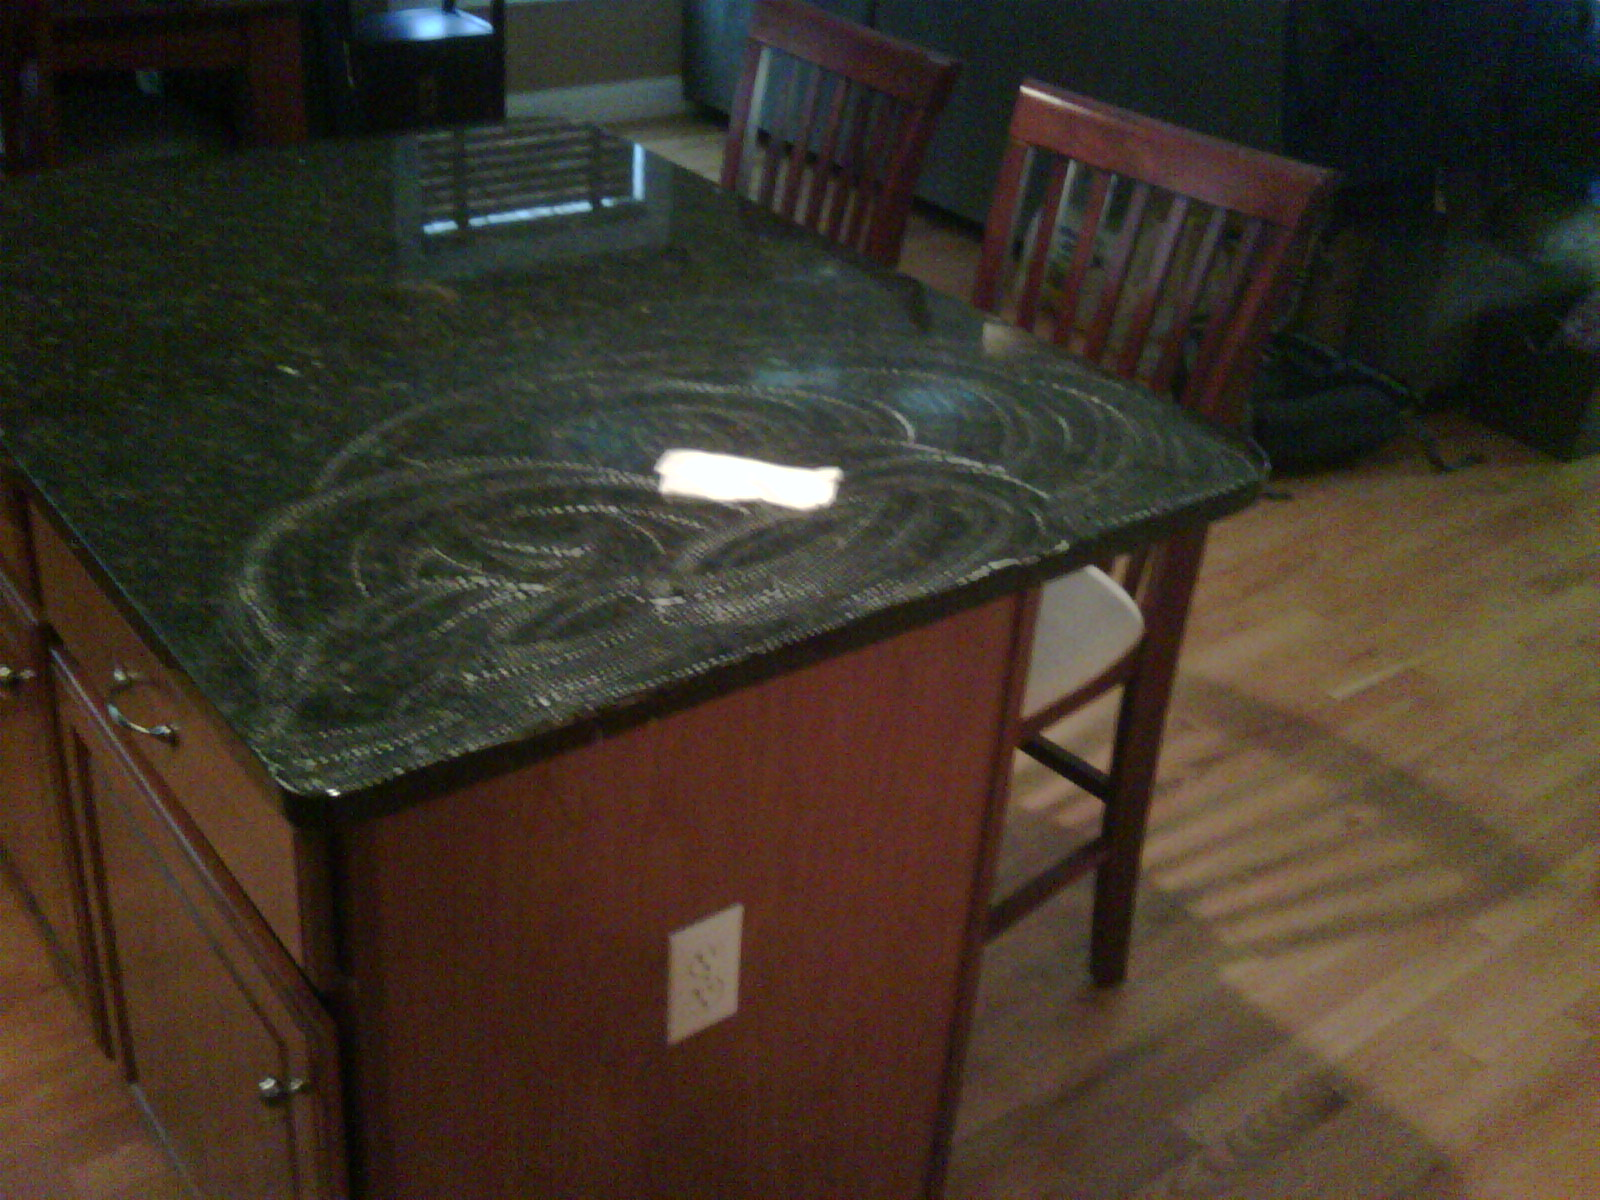 How To Waxing Your Granite Countertops